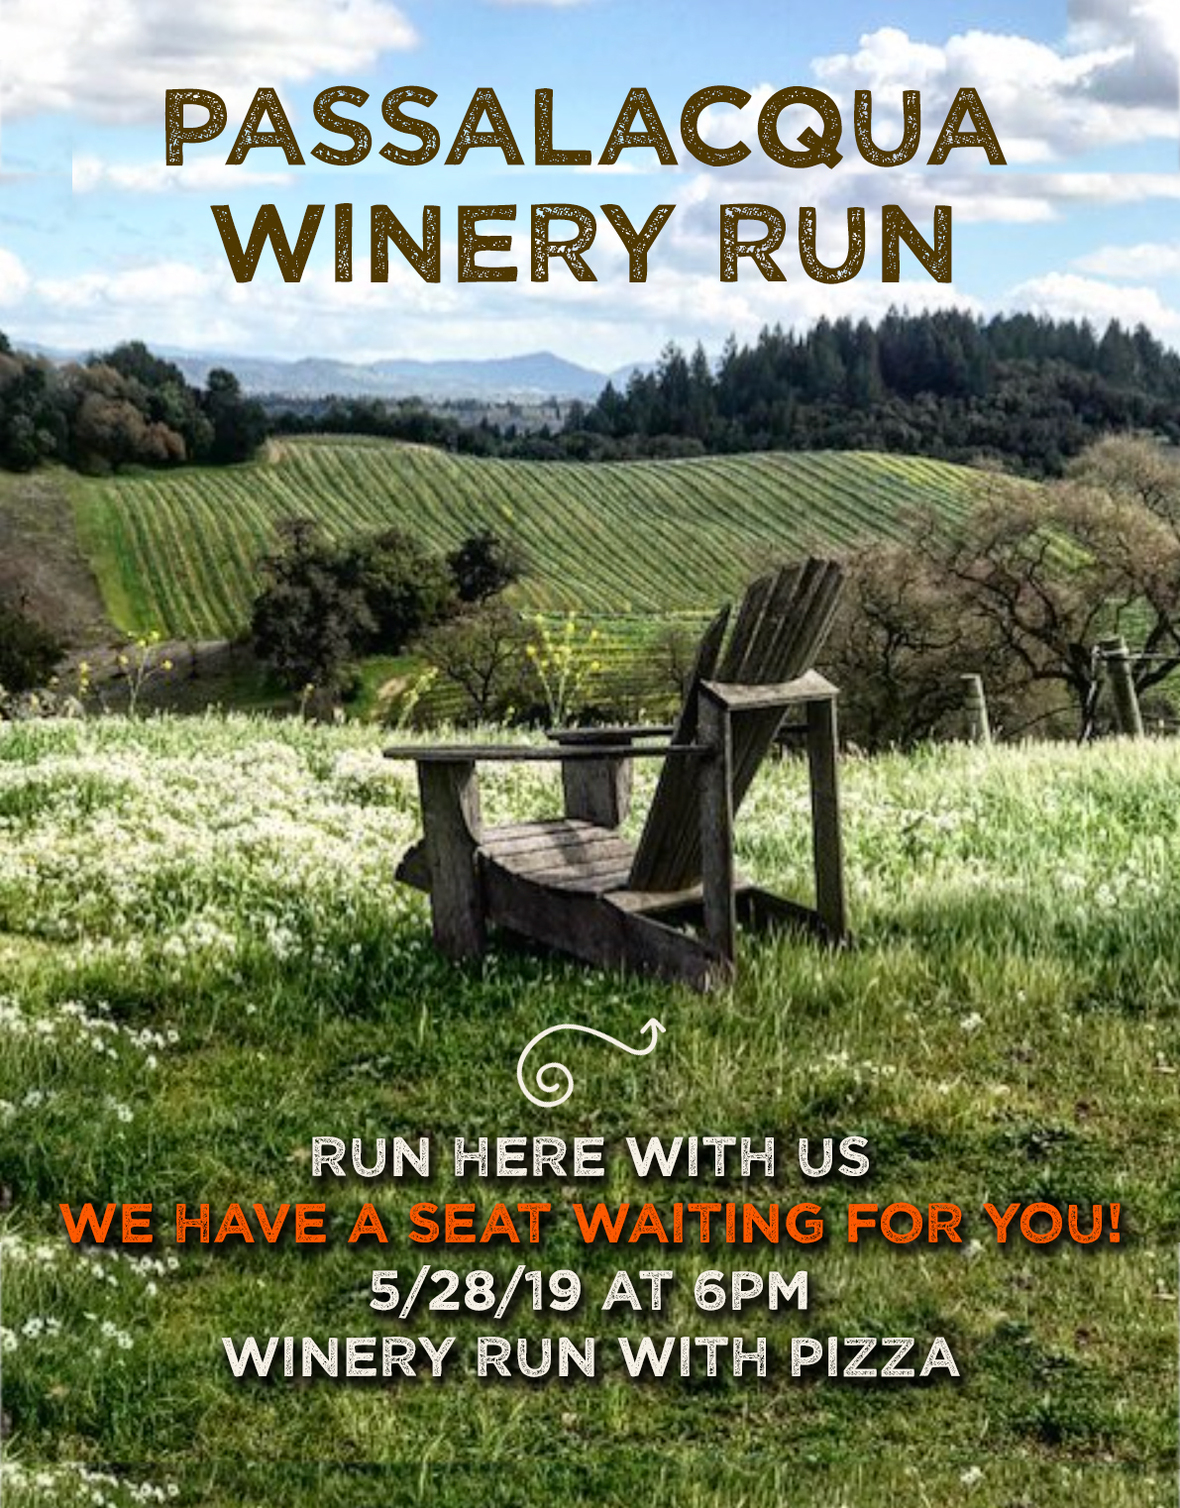 Passalacqua winery run